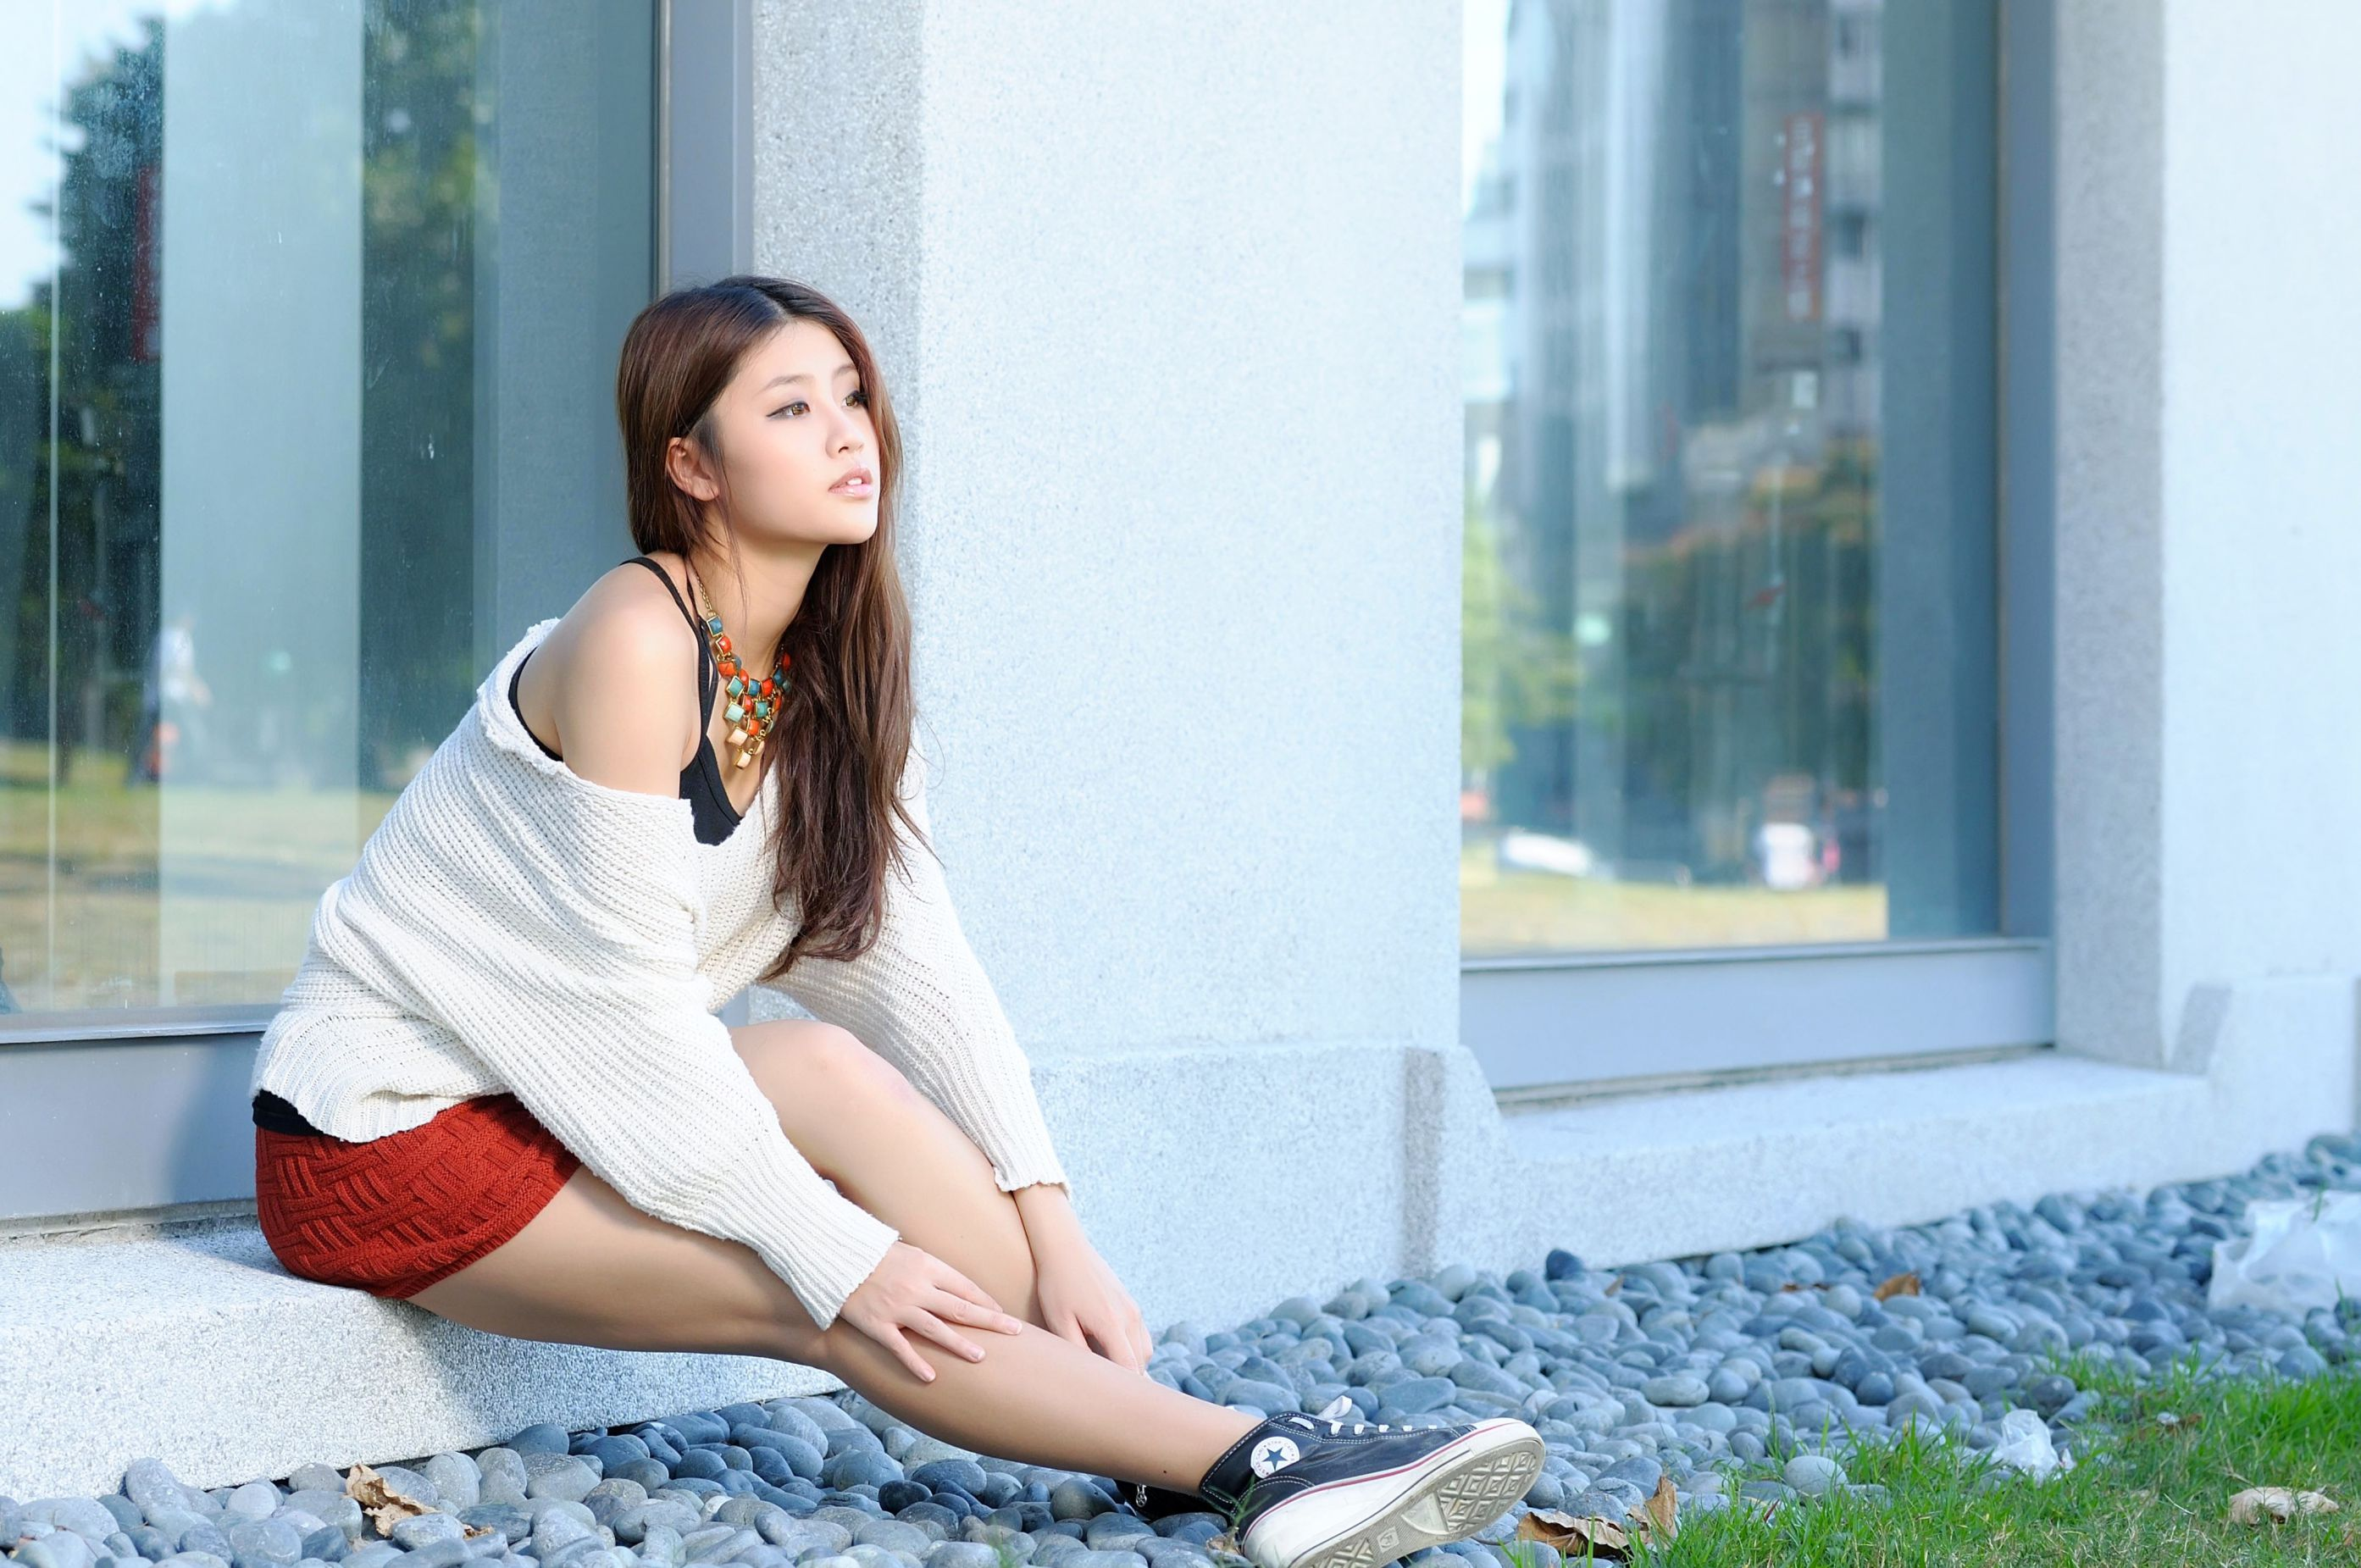 VOL.372 [台湾正妹]气质清新唯美女神:林真亦(Yuna)高品质写真套图(42P)